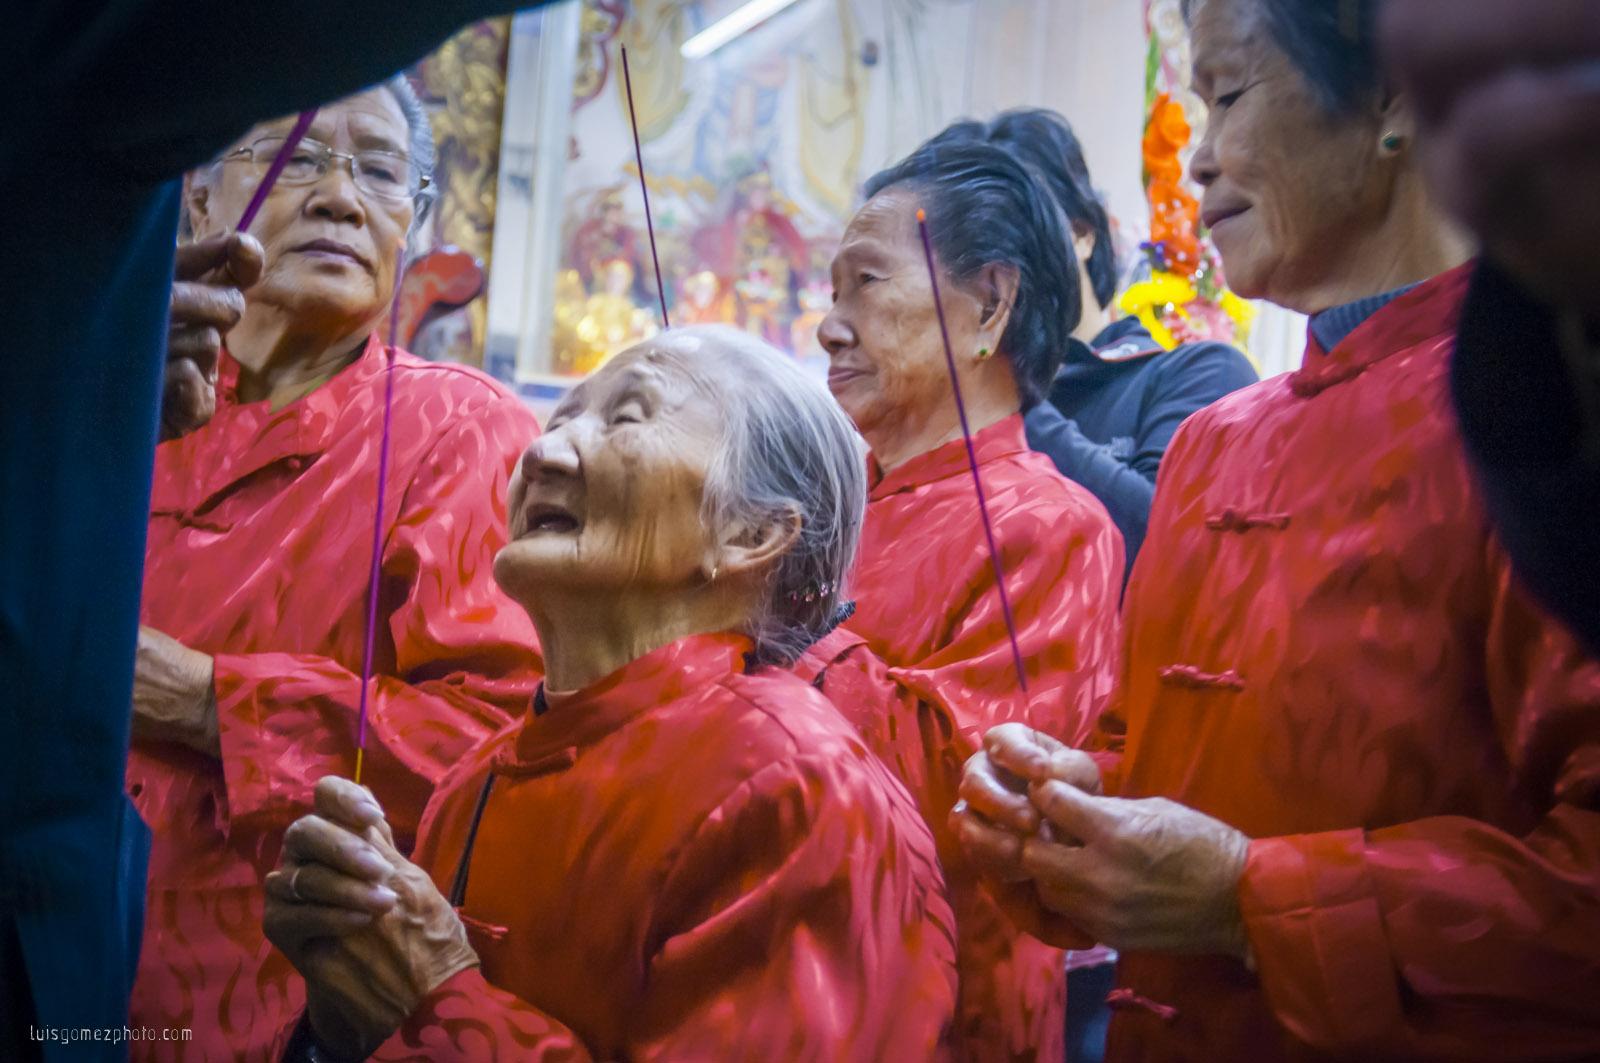 Taoist ritual